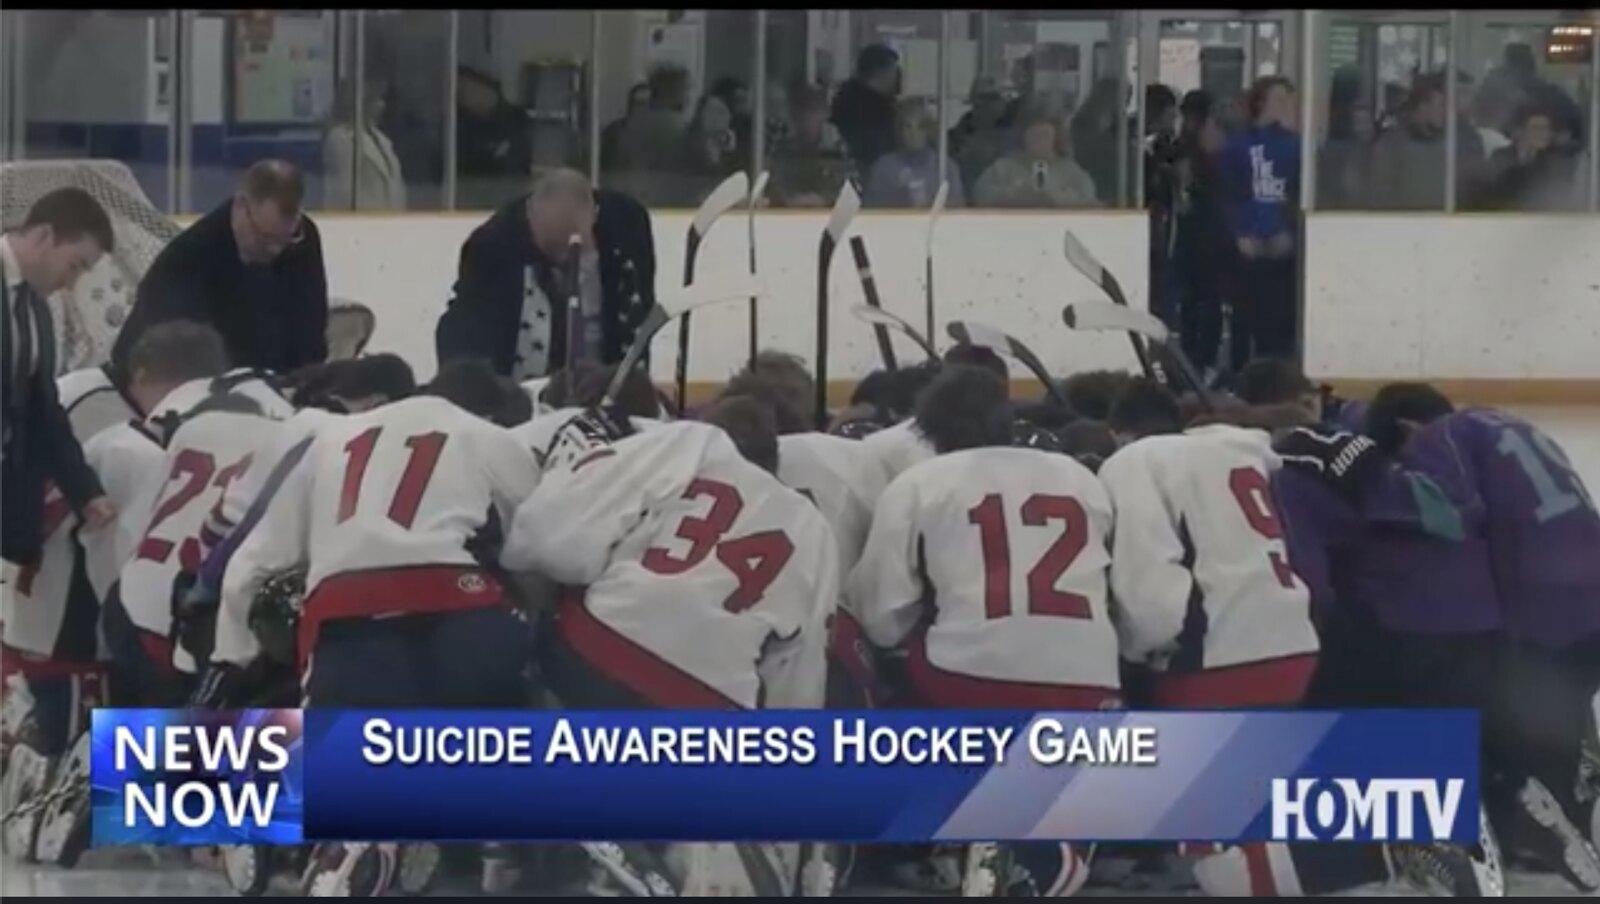 Local Hockey Team Raises Awareness for Suicide Prevention